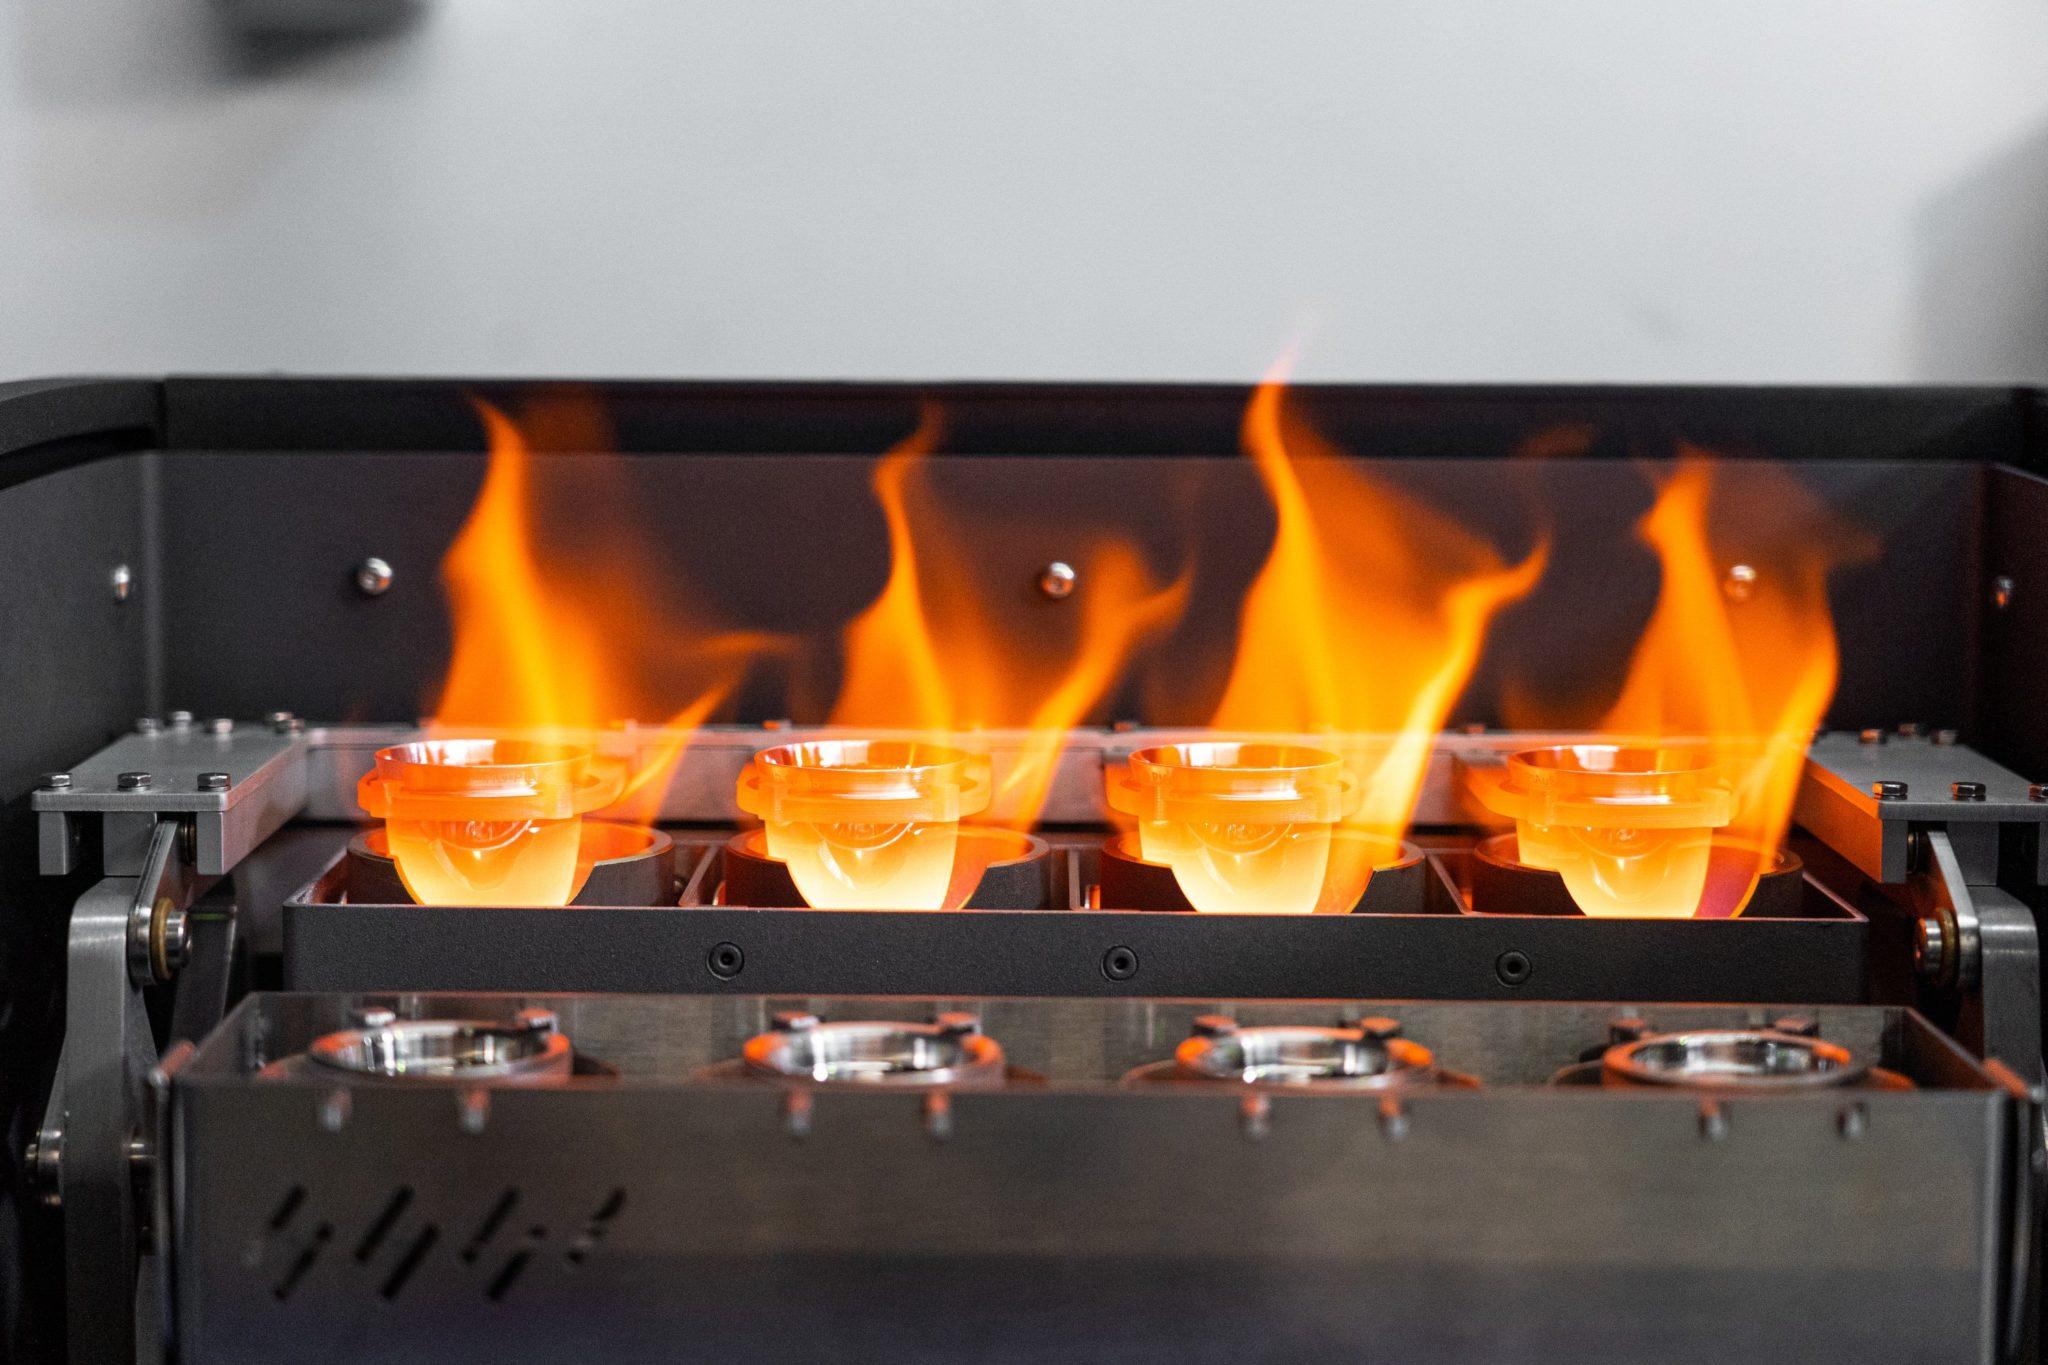 4 inconel 625 crucibles being held over intense heat